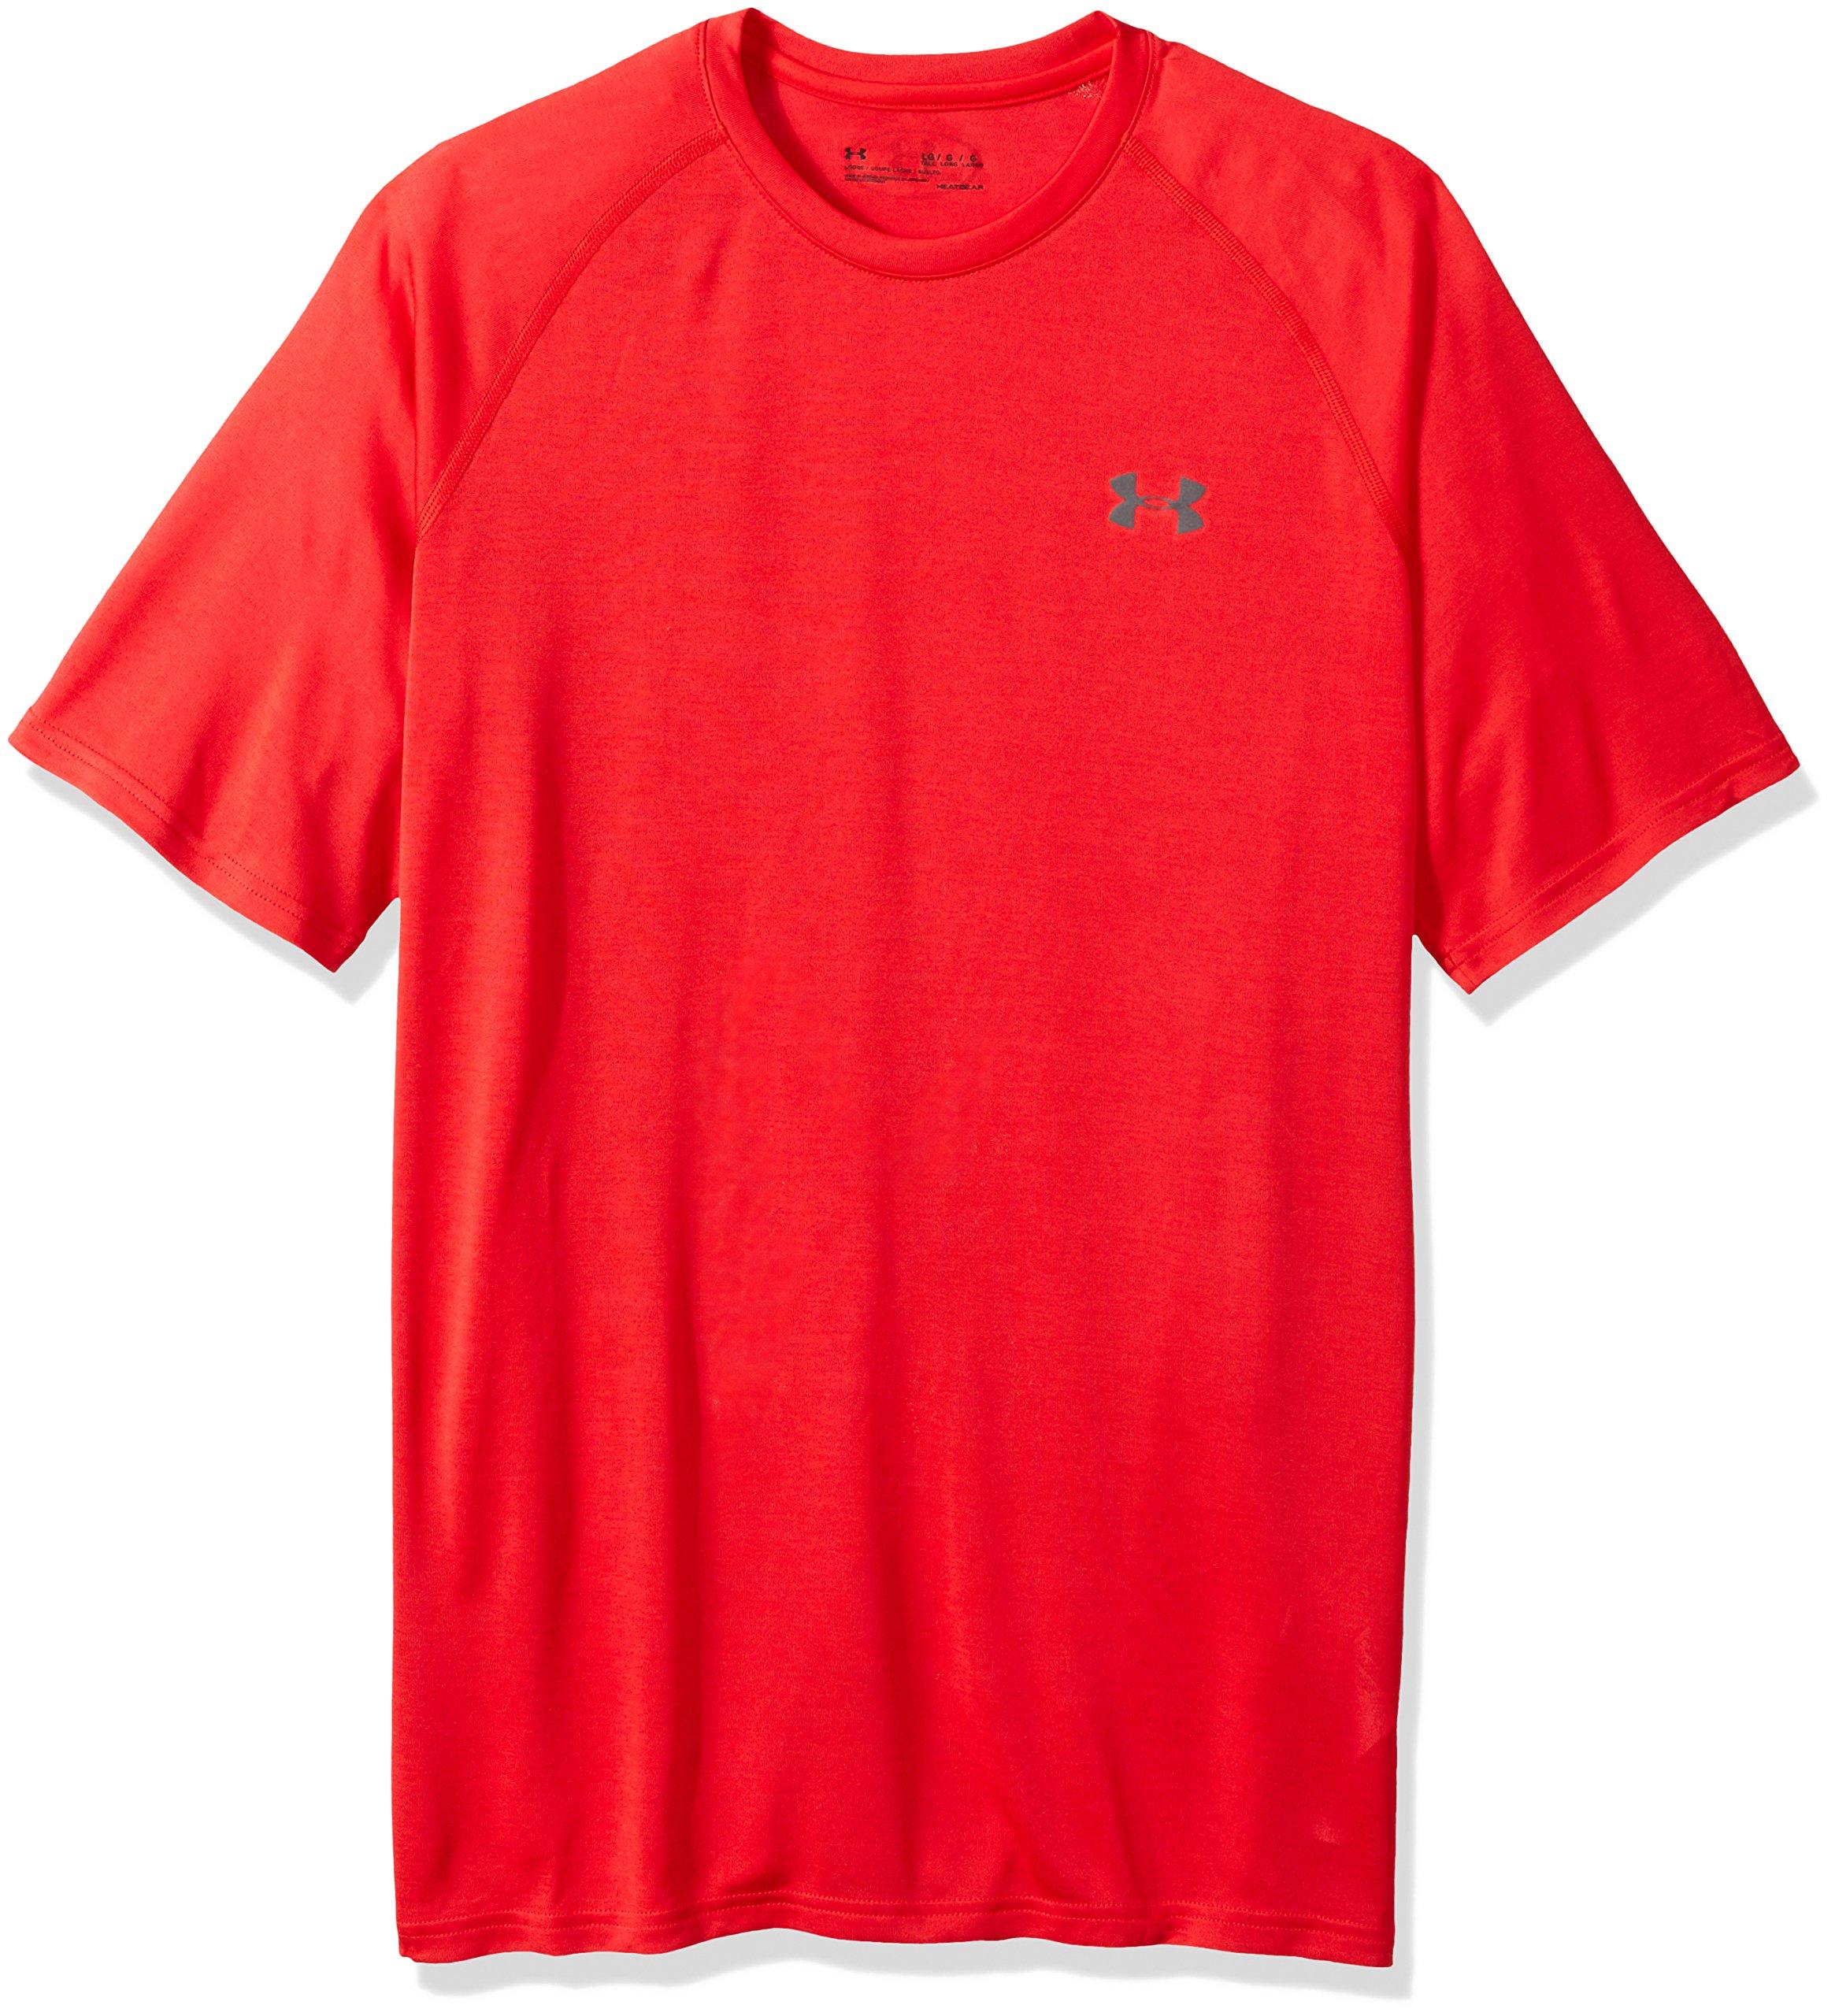 Under Armour Men's Tech Short Sleeve T-Shirt, Pierce (629)/Rhino Gray, Small